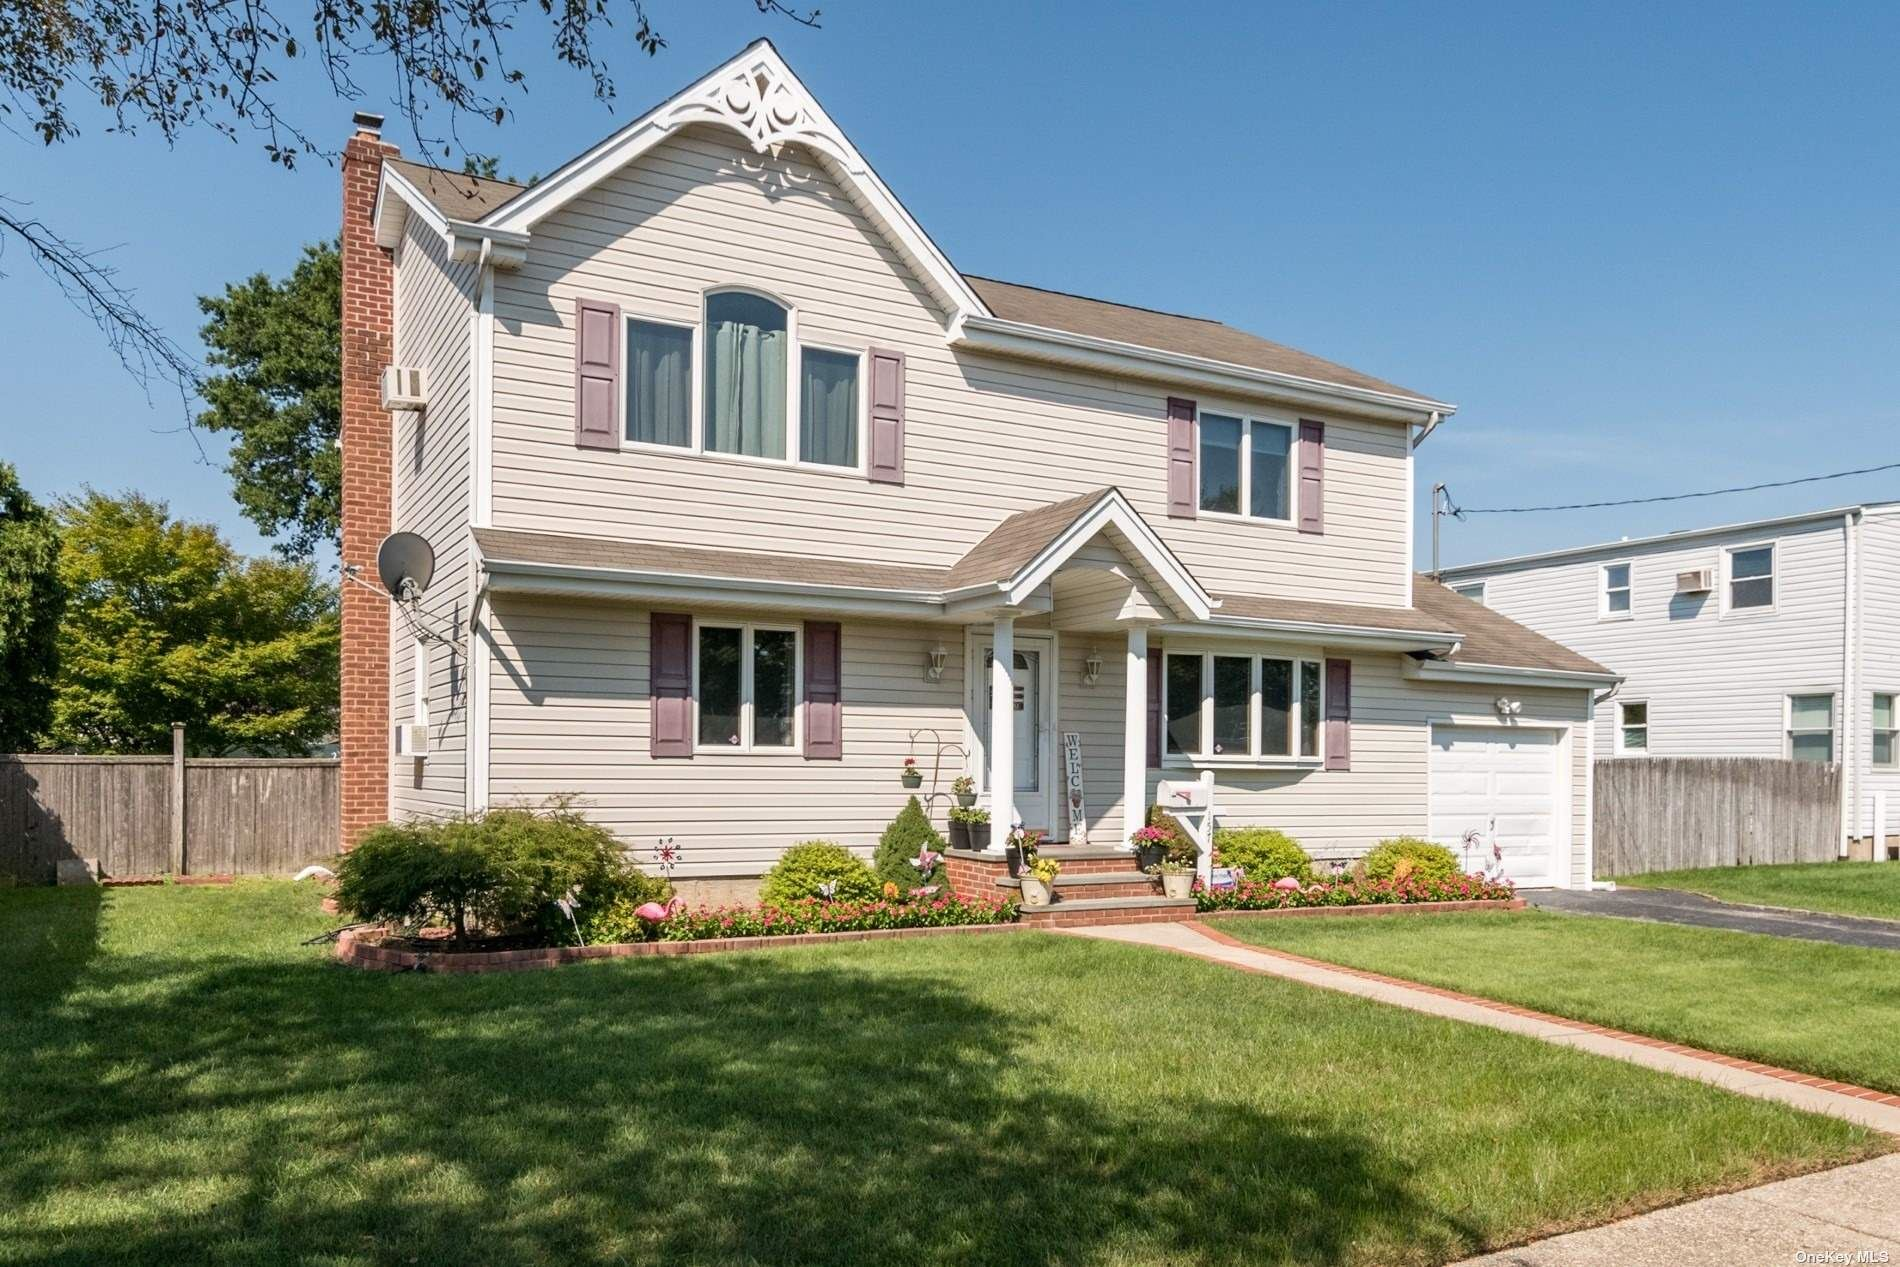 157 E Zoranne Drive, Farmingdale, NY 11735 - MLS#: 3342209